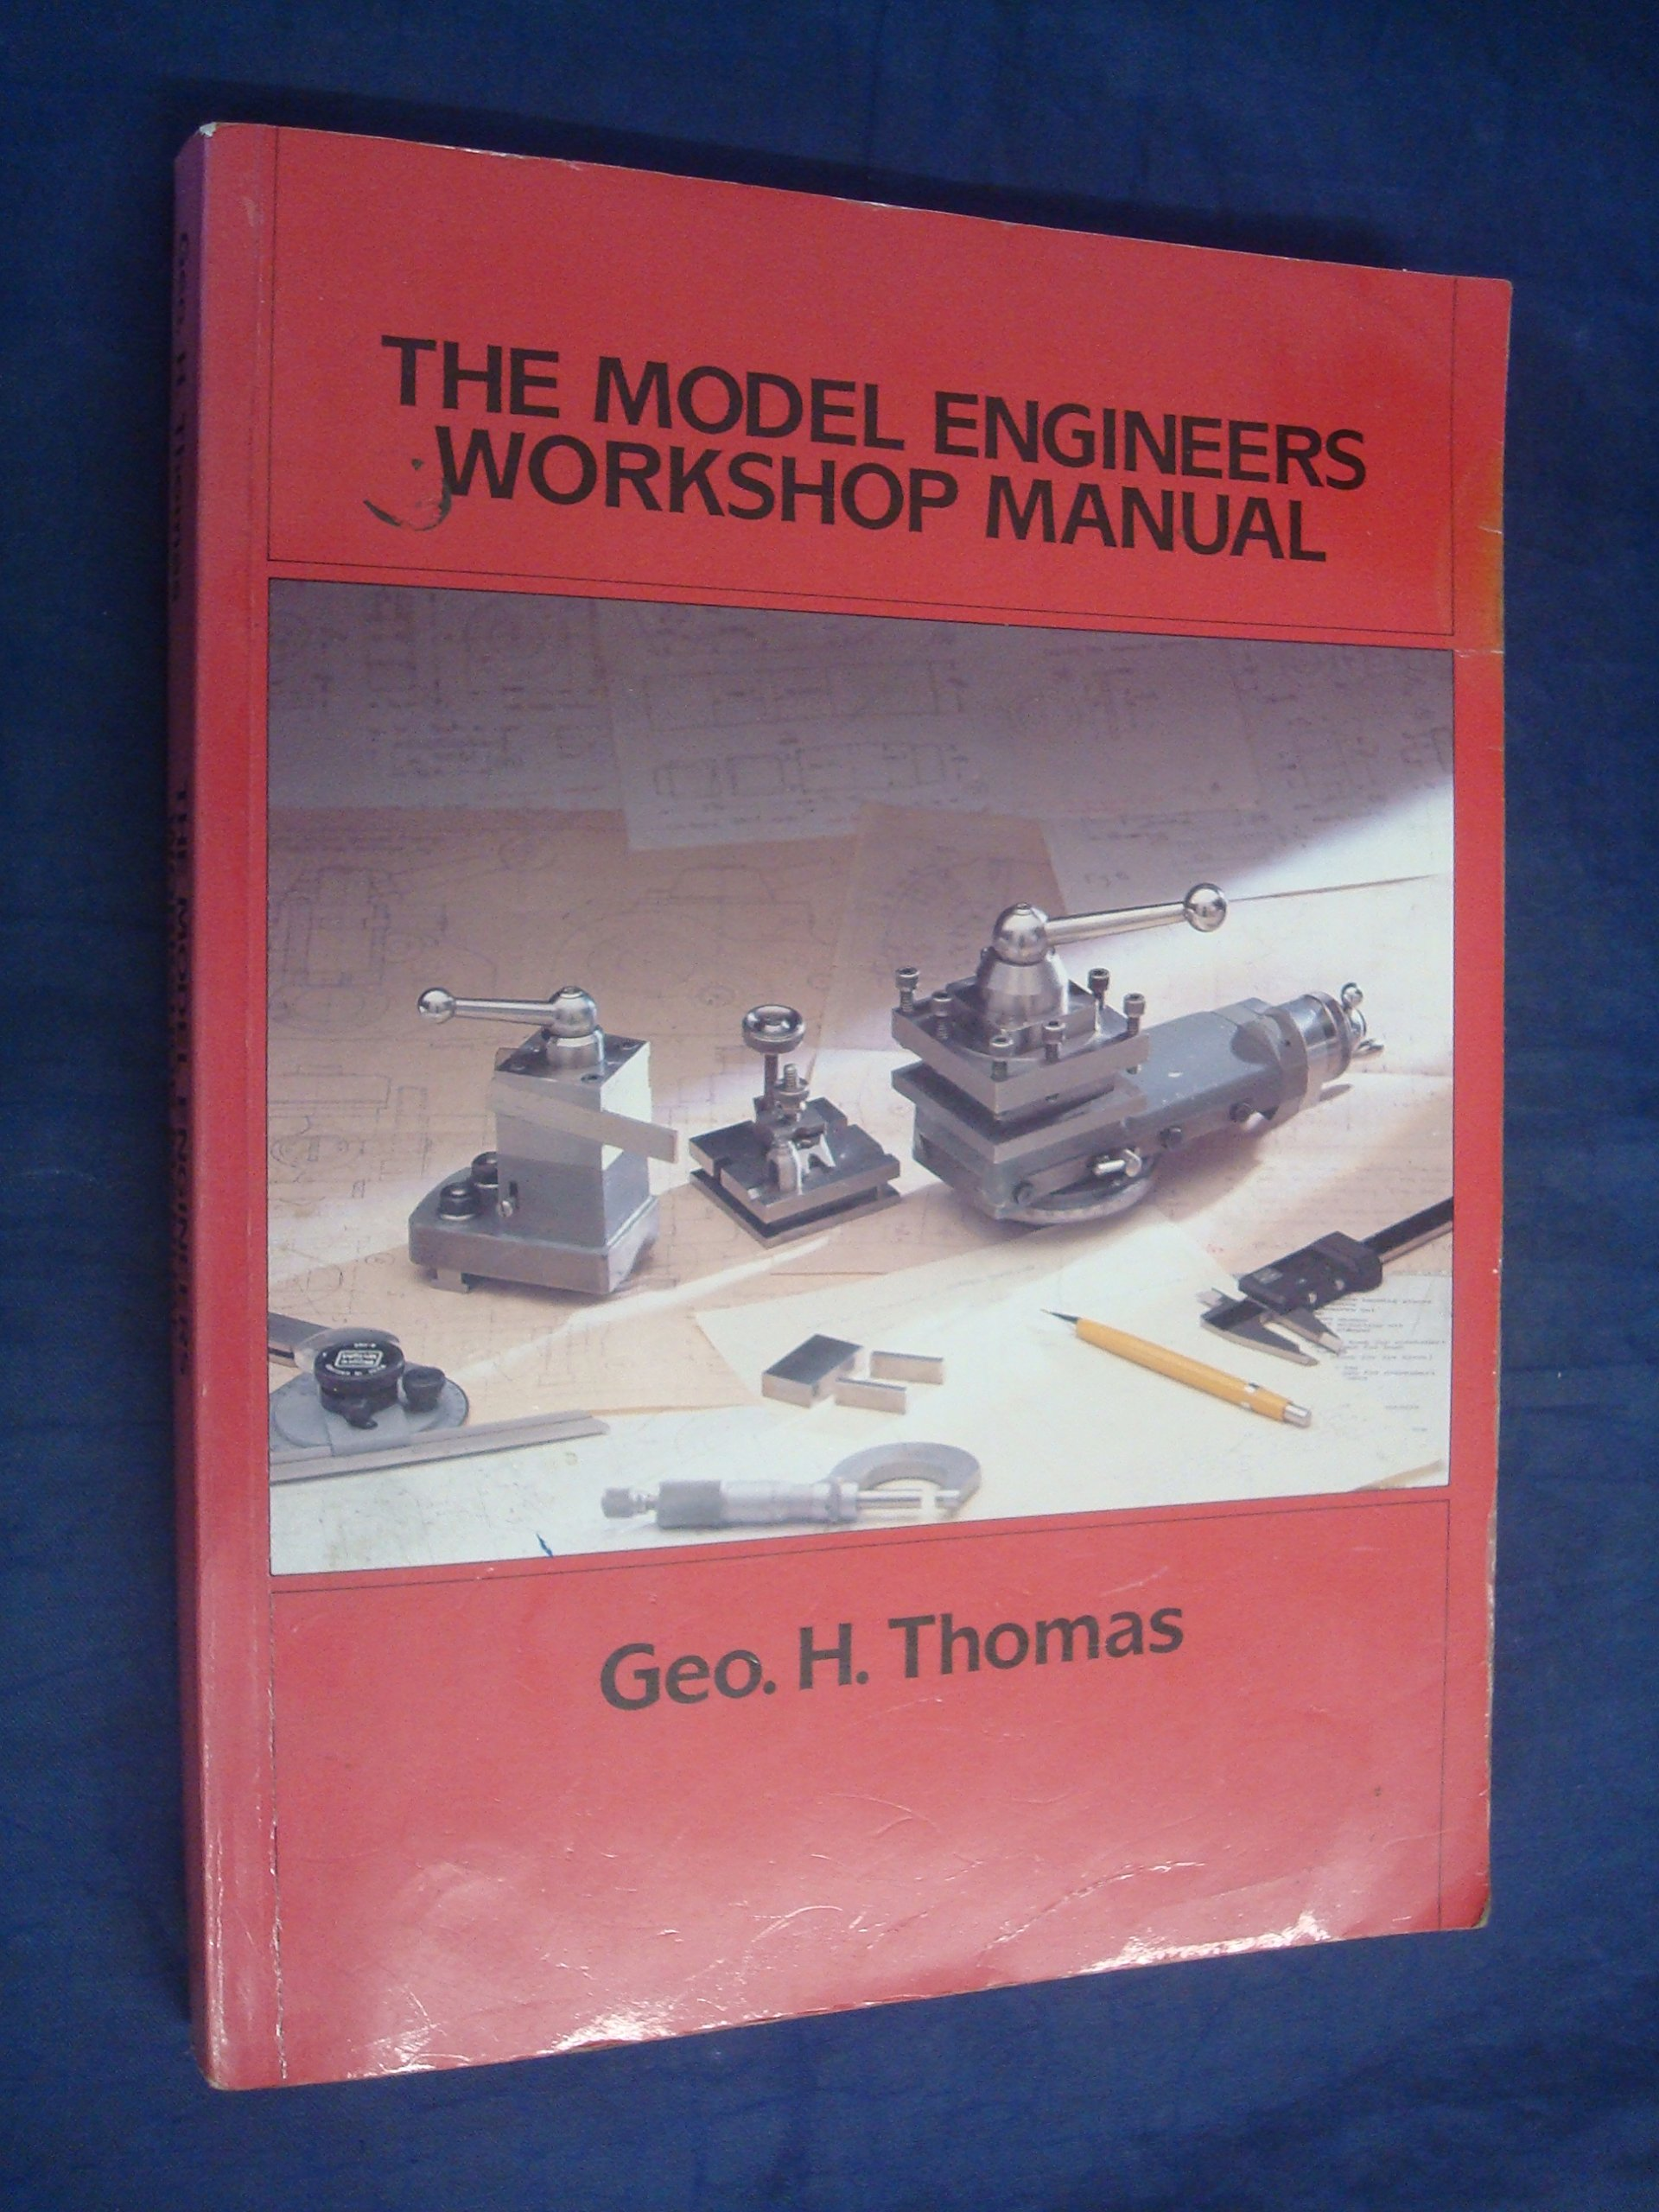 model engineers workshop manual past masters g h thomas rh amazon com model engineers workshop manual george thomas pdf model engineers workshop manual (past masters series)